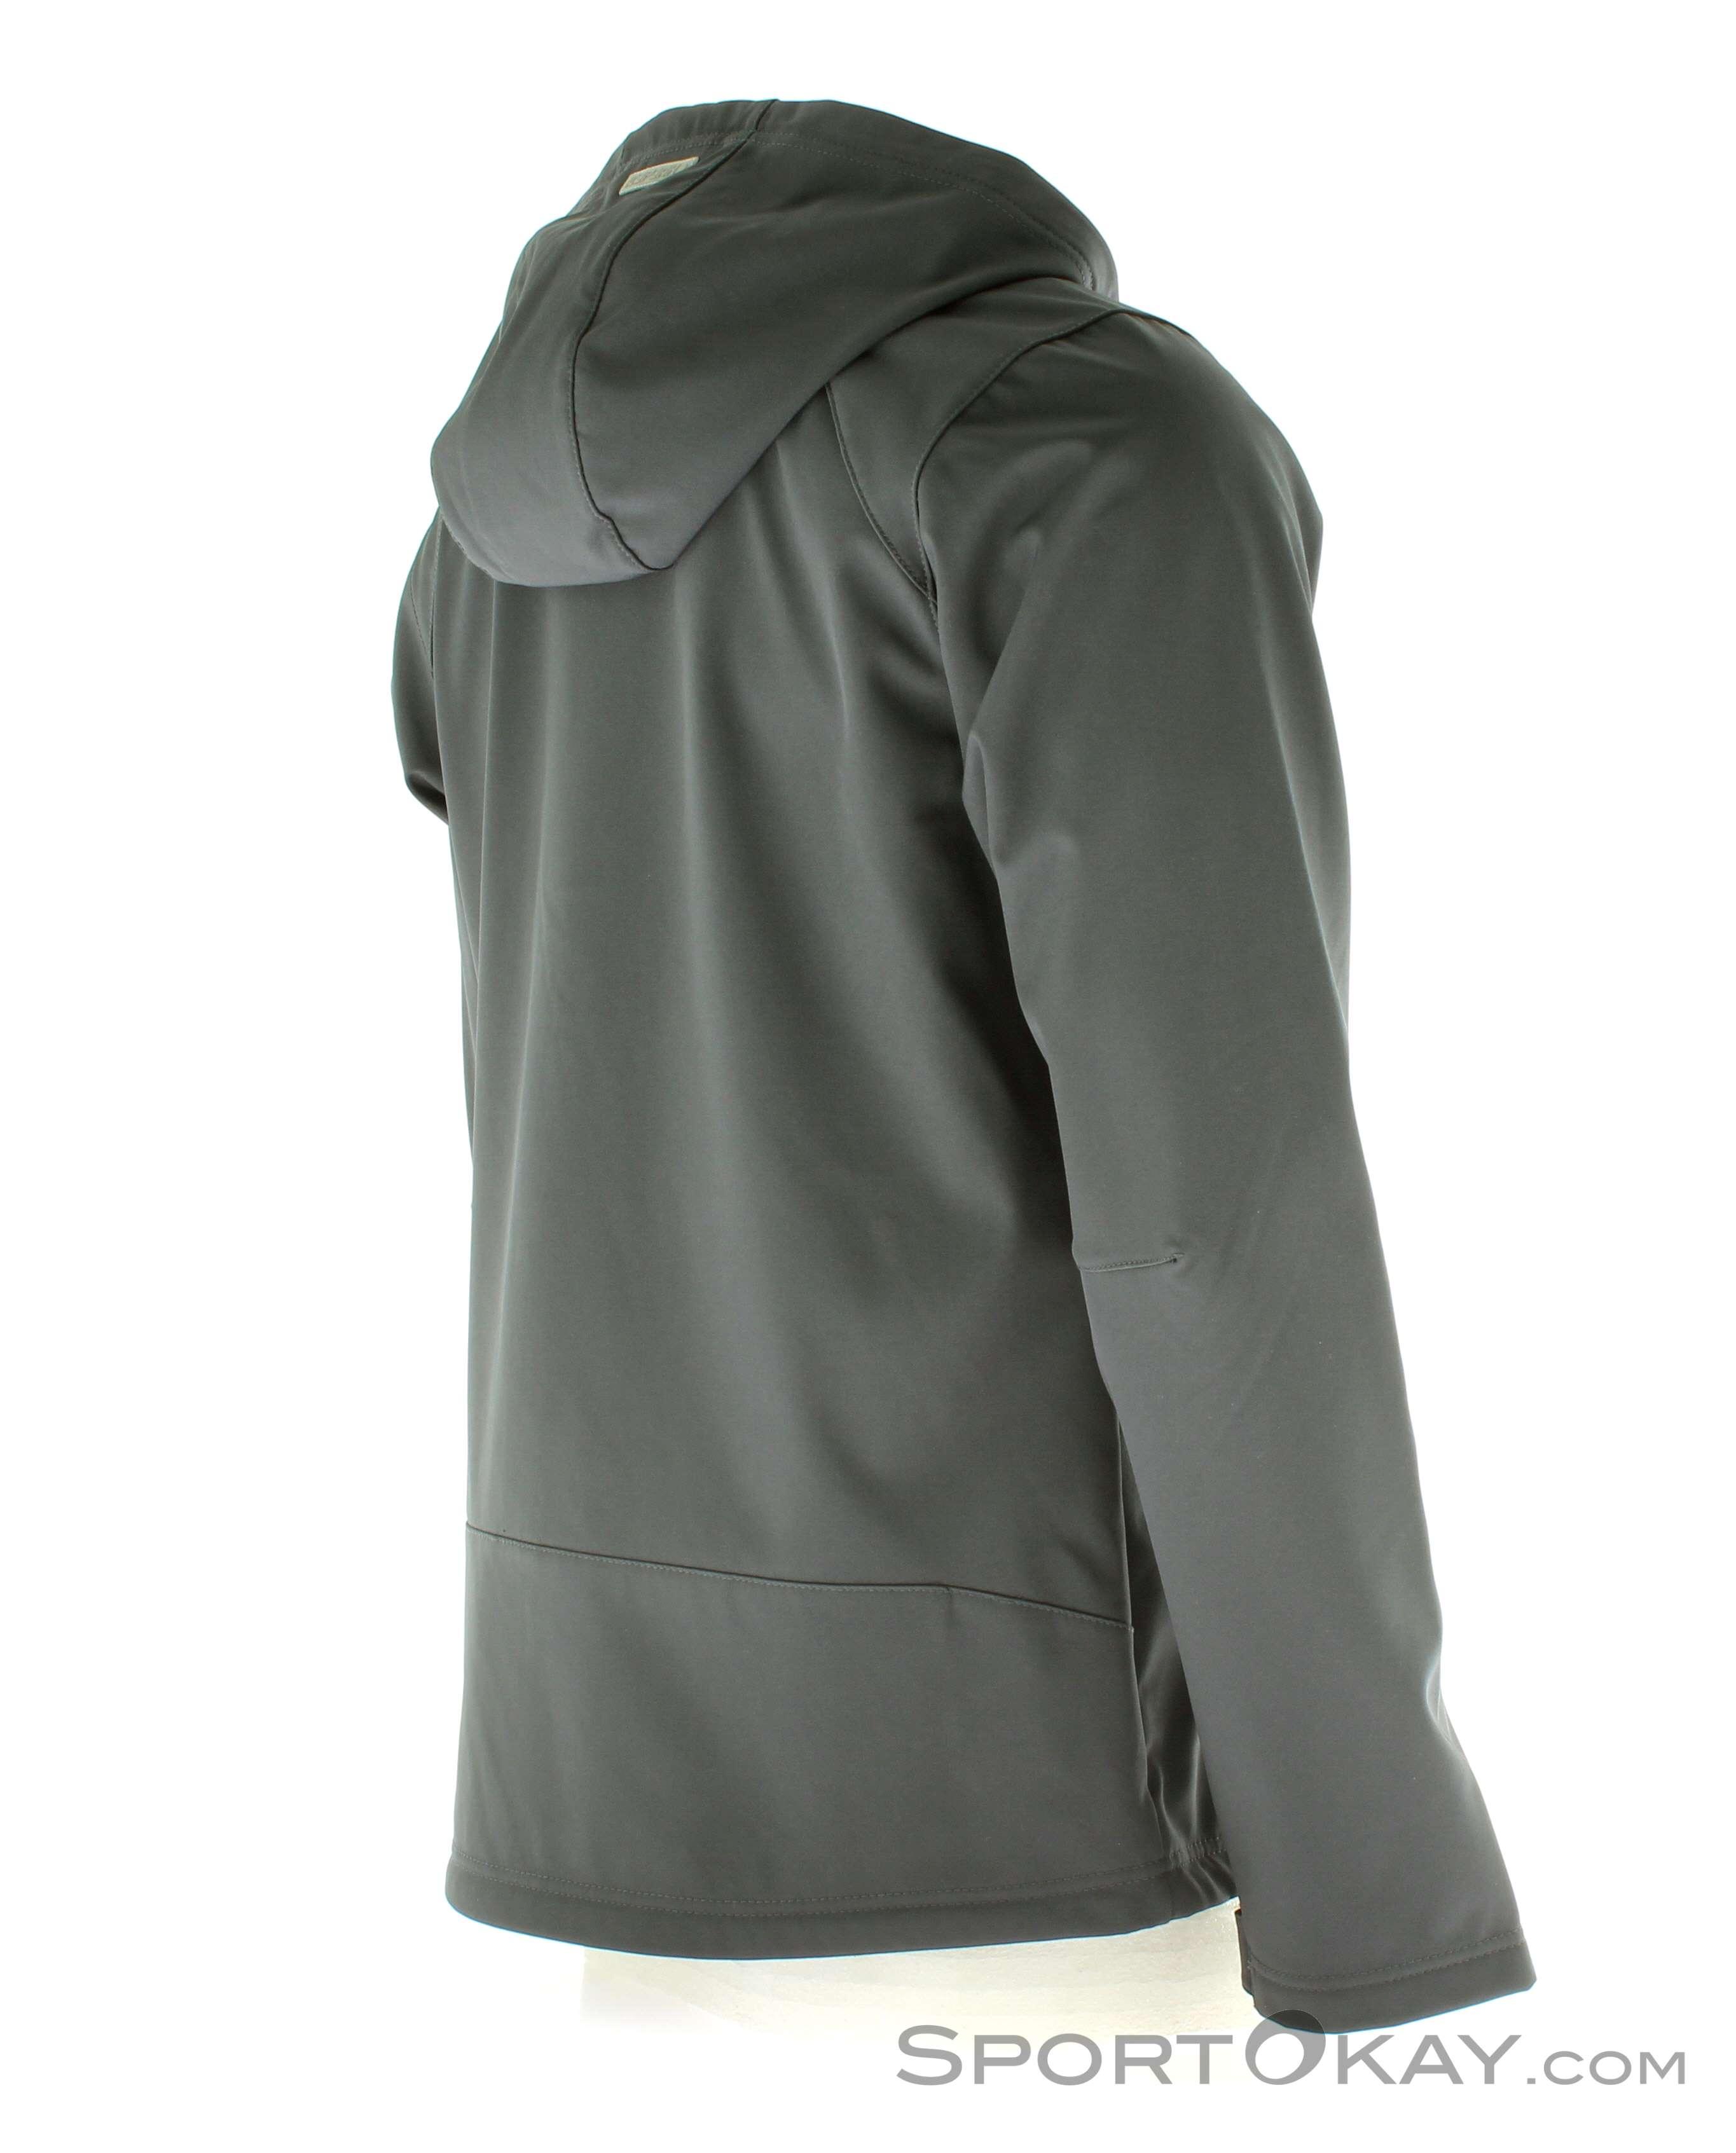 Icepeak Qwfcwi Giacche Uomo Giacca Softshell Outdoor Pent Abbigliamento  PWpdRgnq 24f5cde82c4